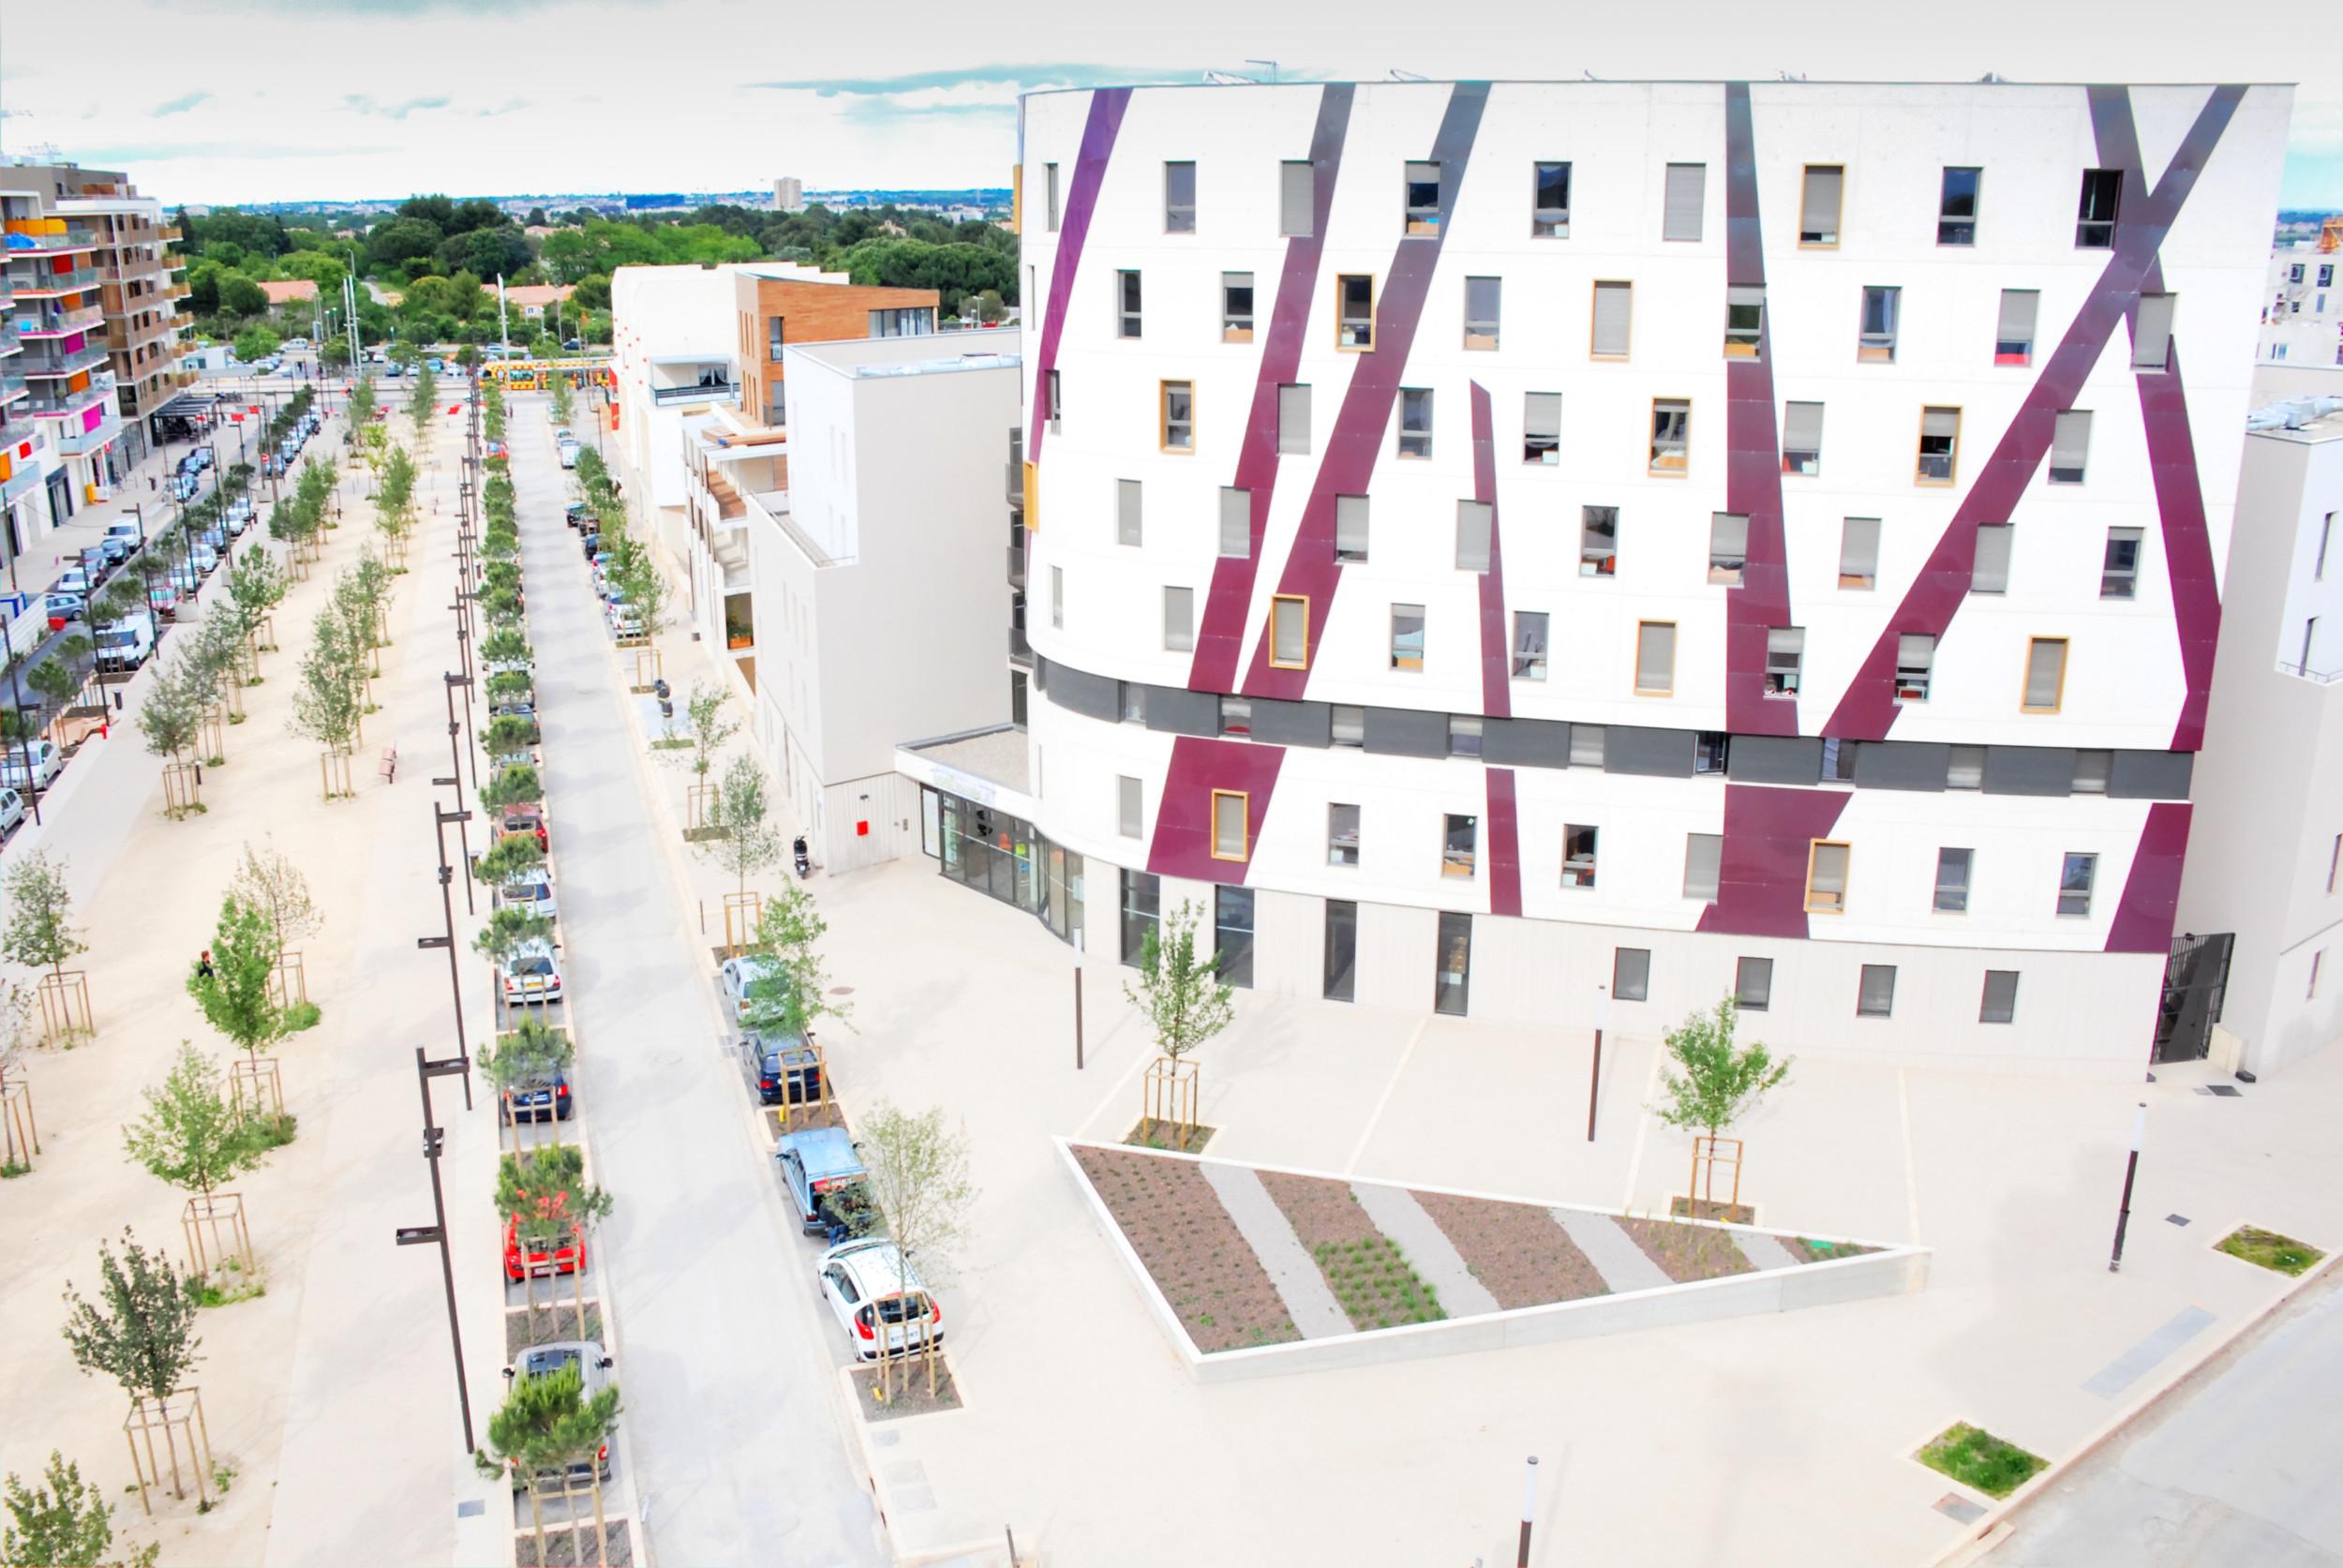 Location RESILOGIS - COTE RAMBLA - Montpellier (34080)